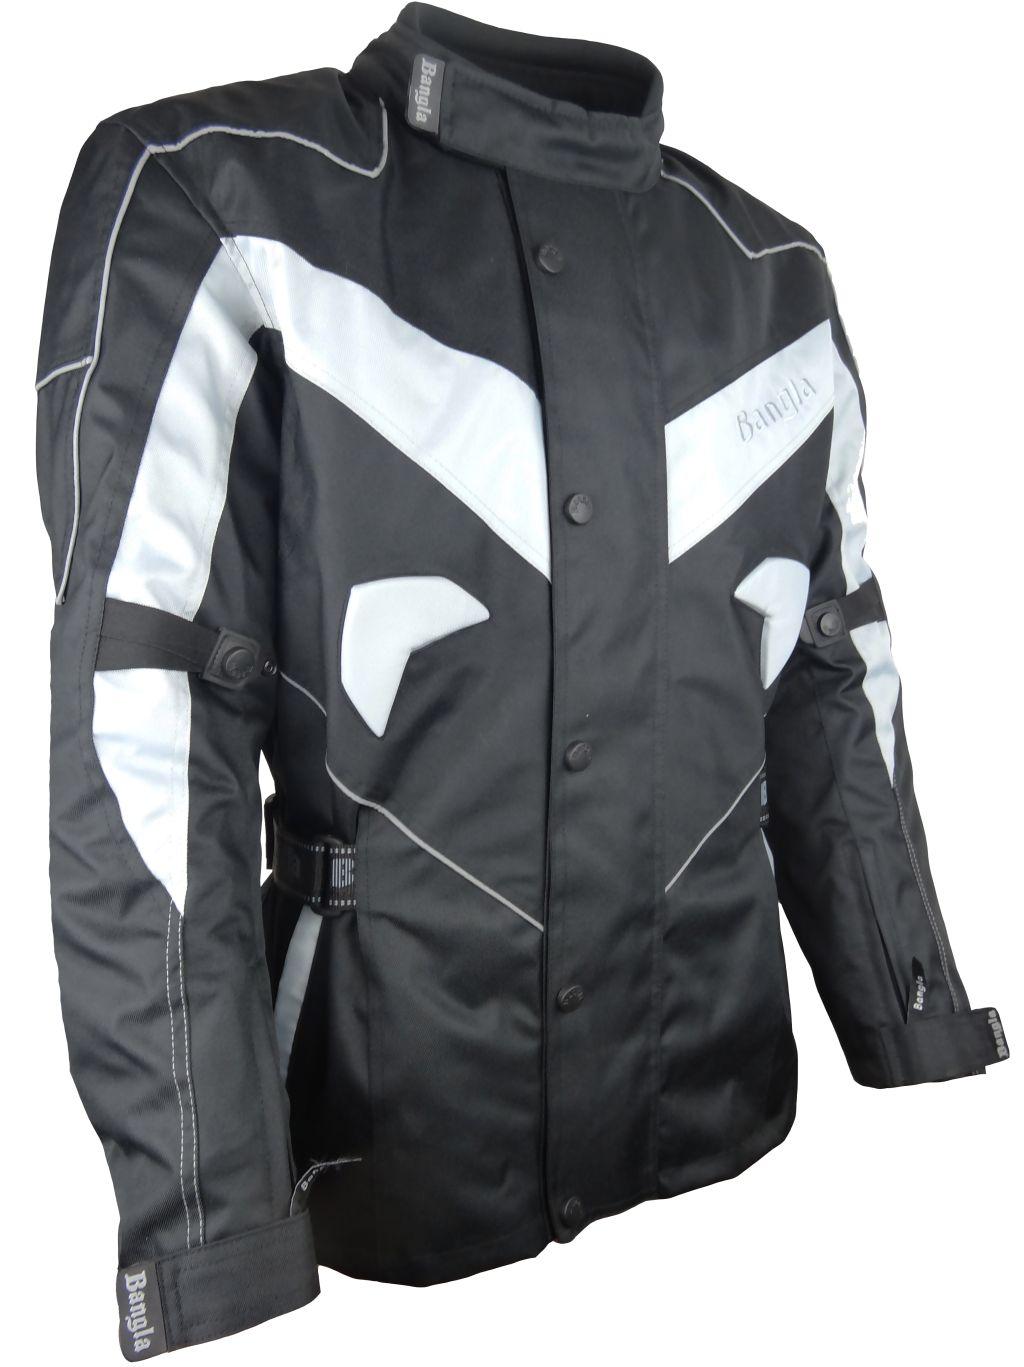 Bangla Motorrad Jacke Cordura Winter Fleece Motorradjacke S - 6 XL